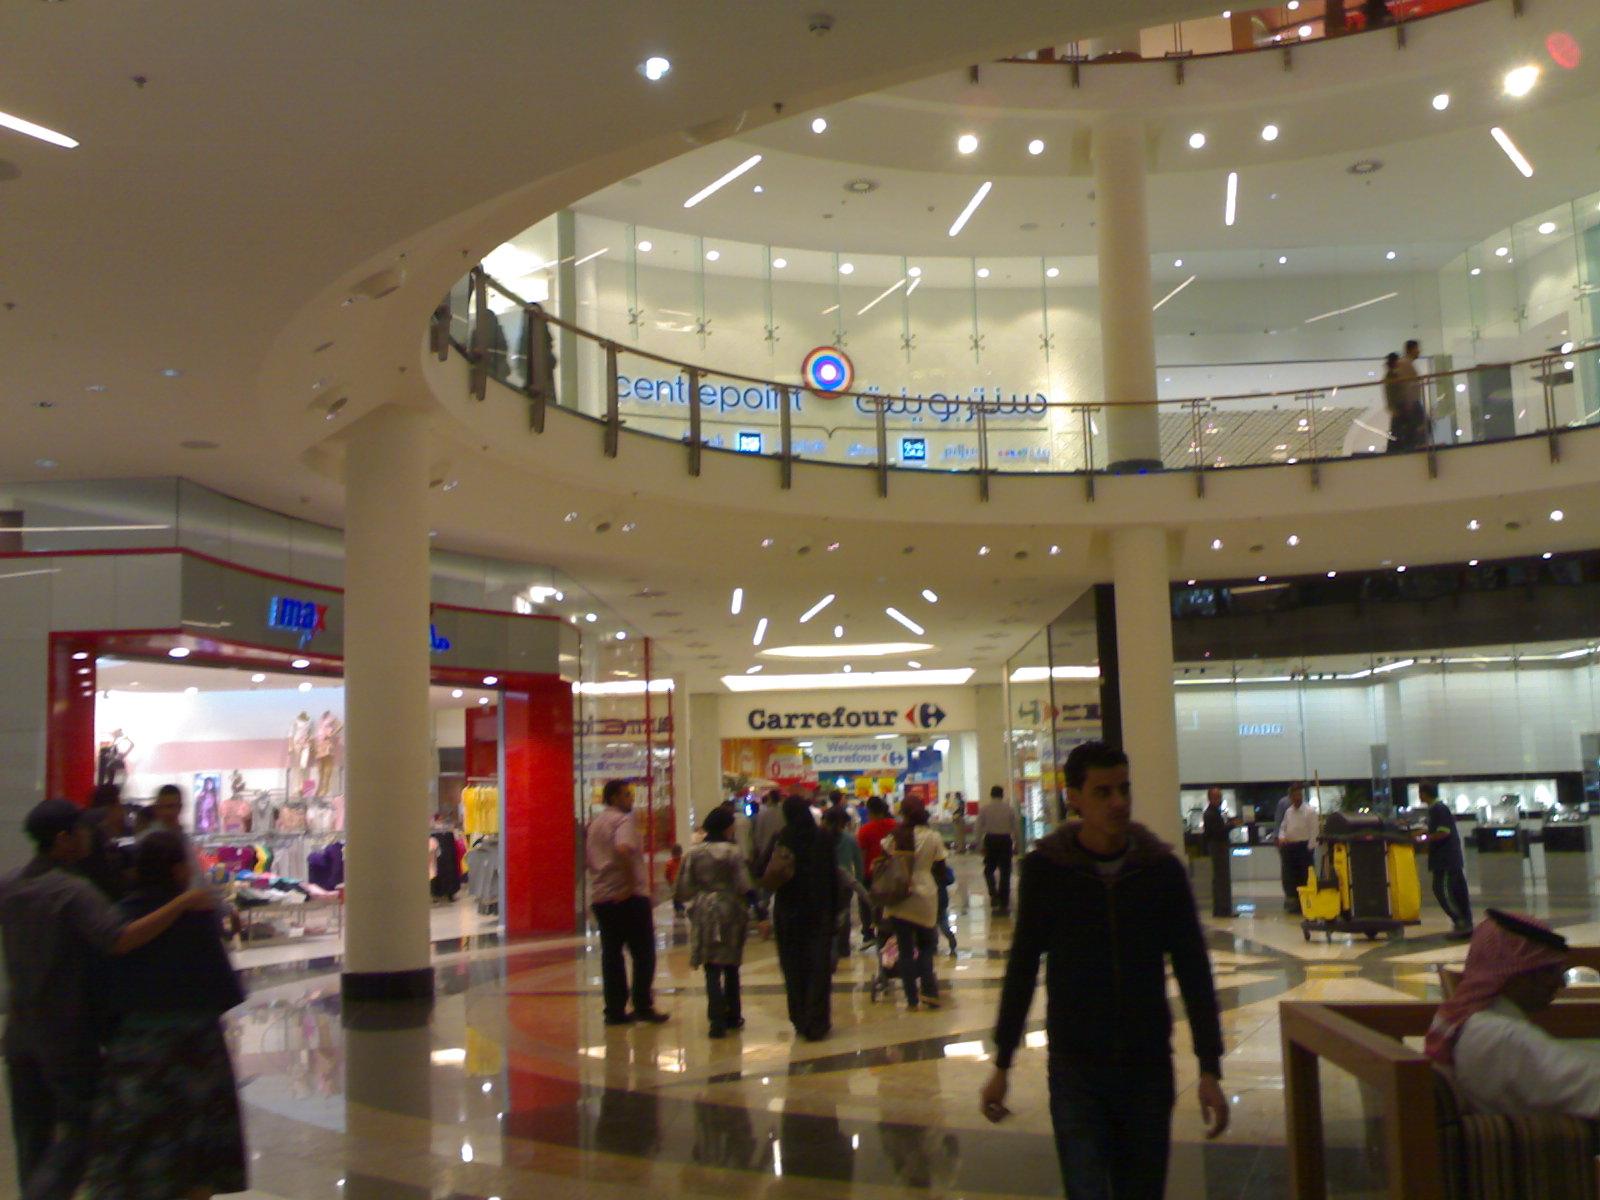 Sanabis (Bahrain) Daily Photo: New City Center Mall in Bahrain